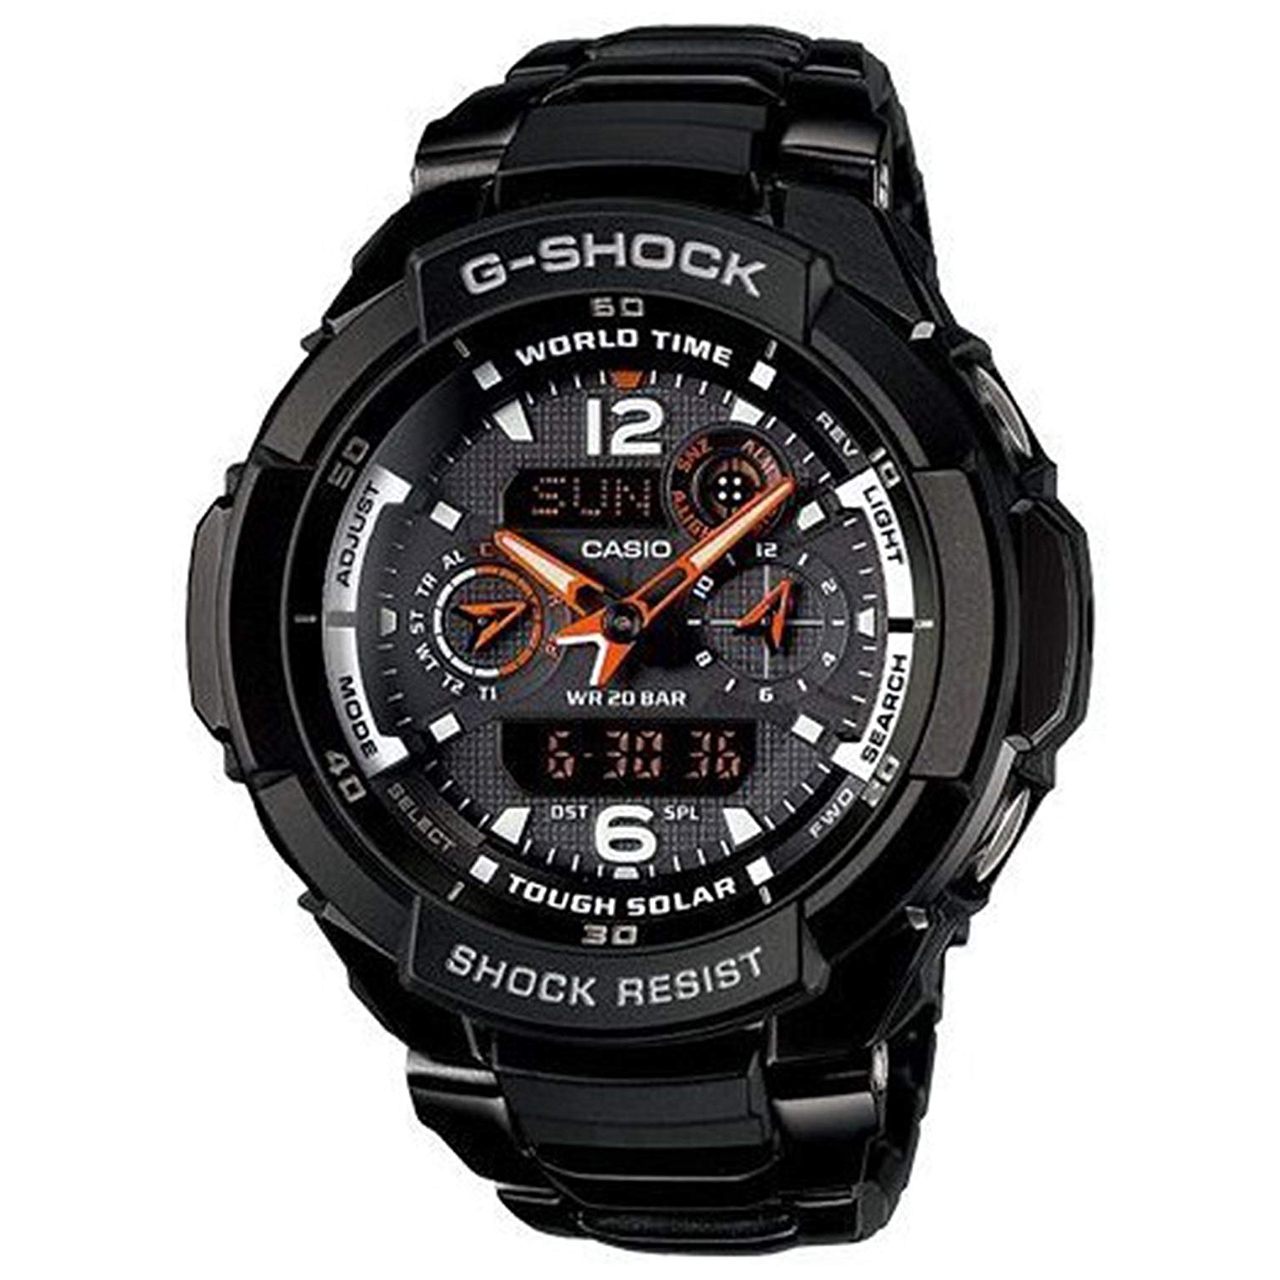 ساعت مچی عقربه ای مردانه کاسیو جی شاک مدل G-1250BD-1ADR